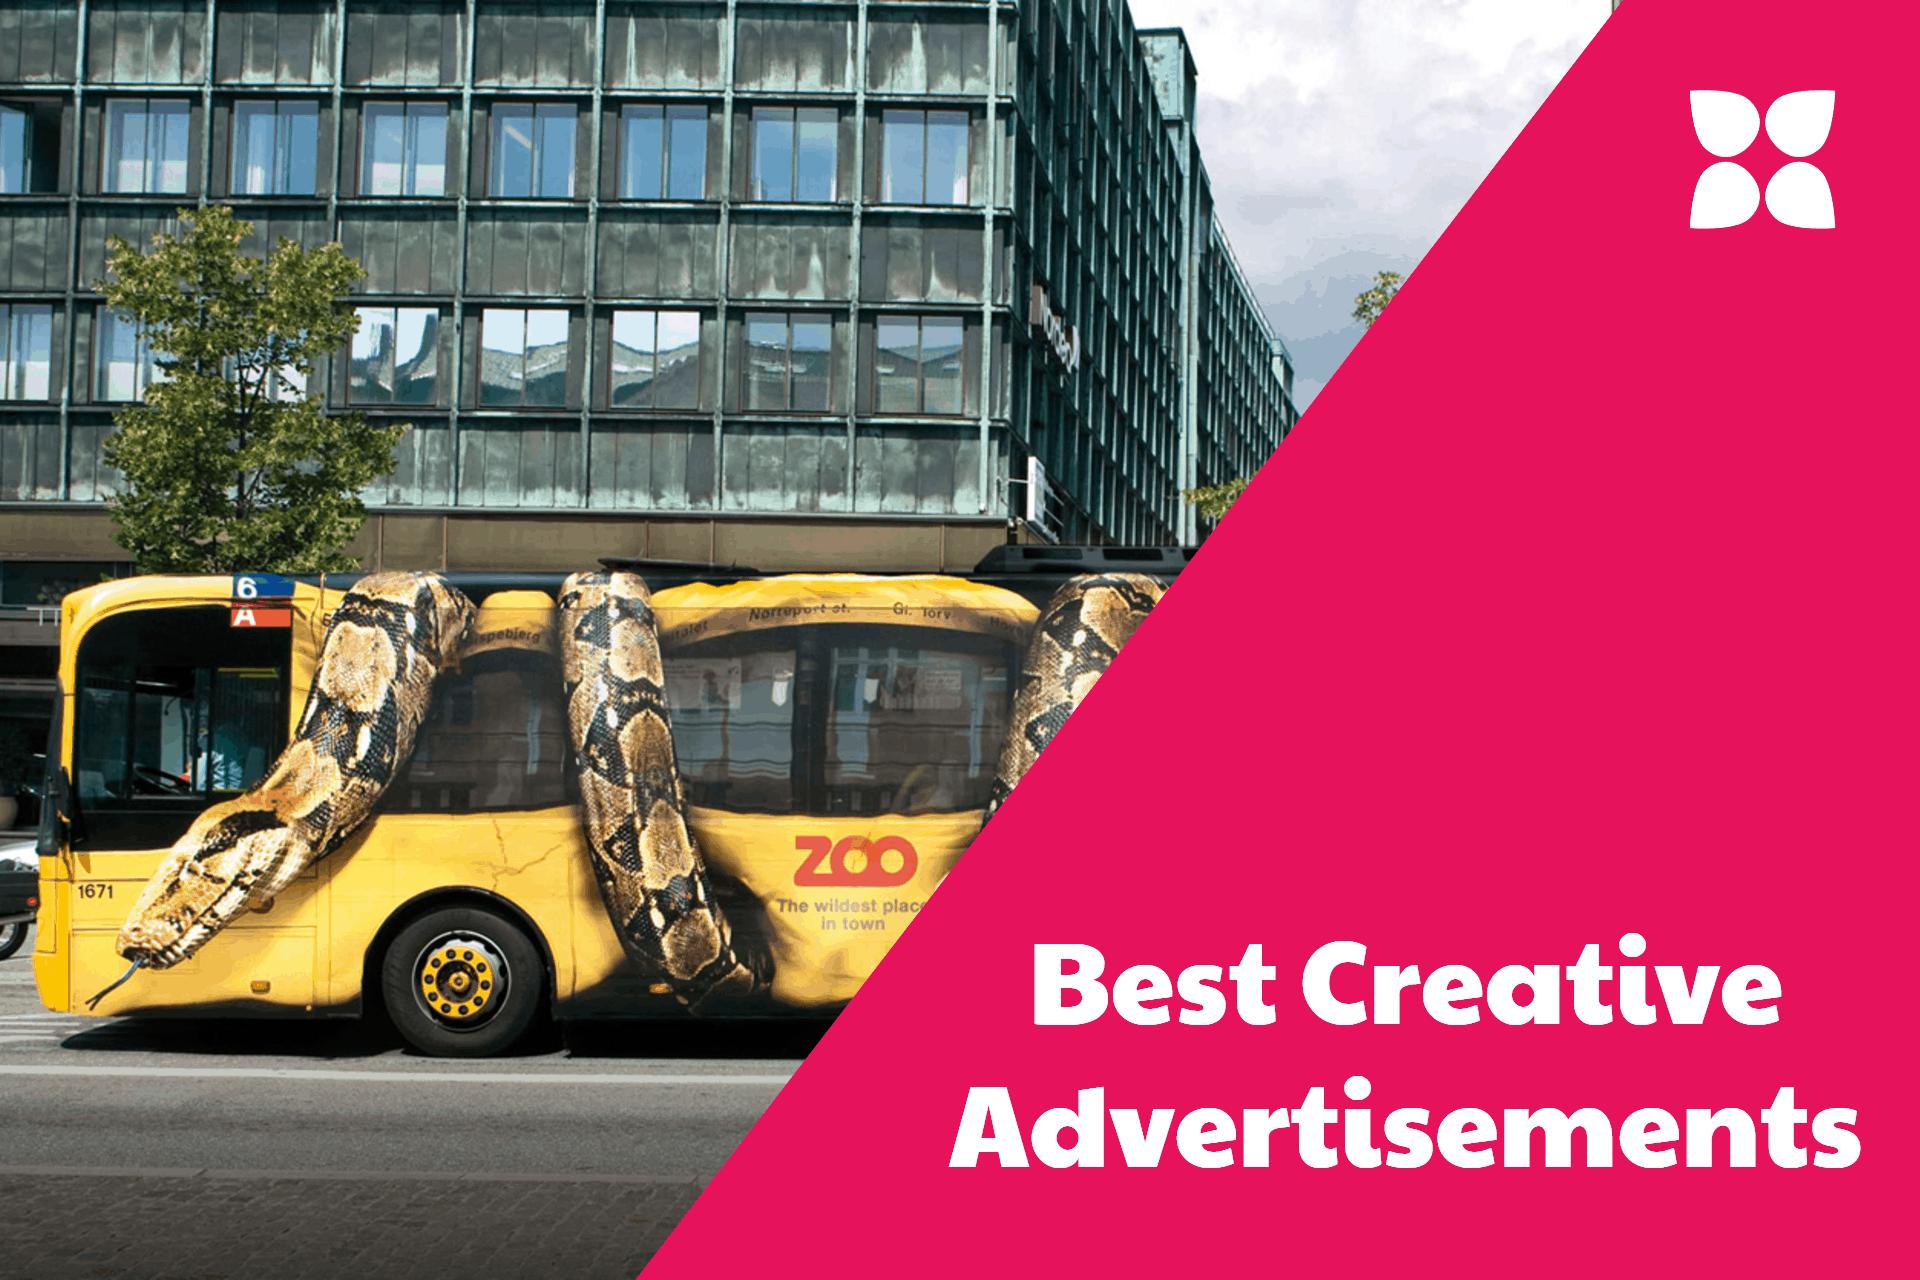 Top 35 Creative Advertisements